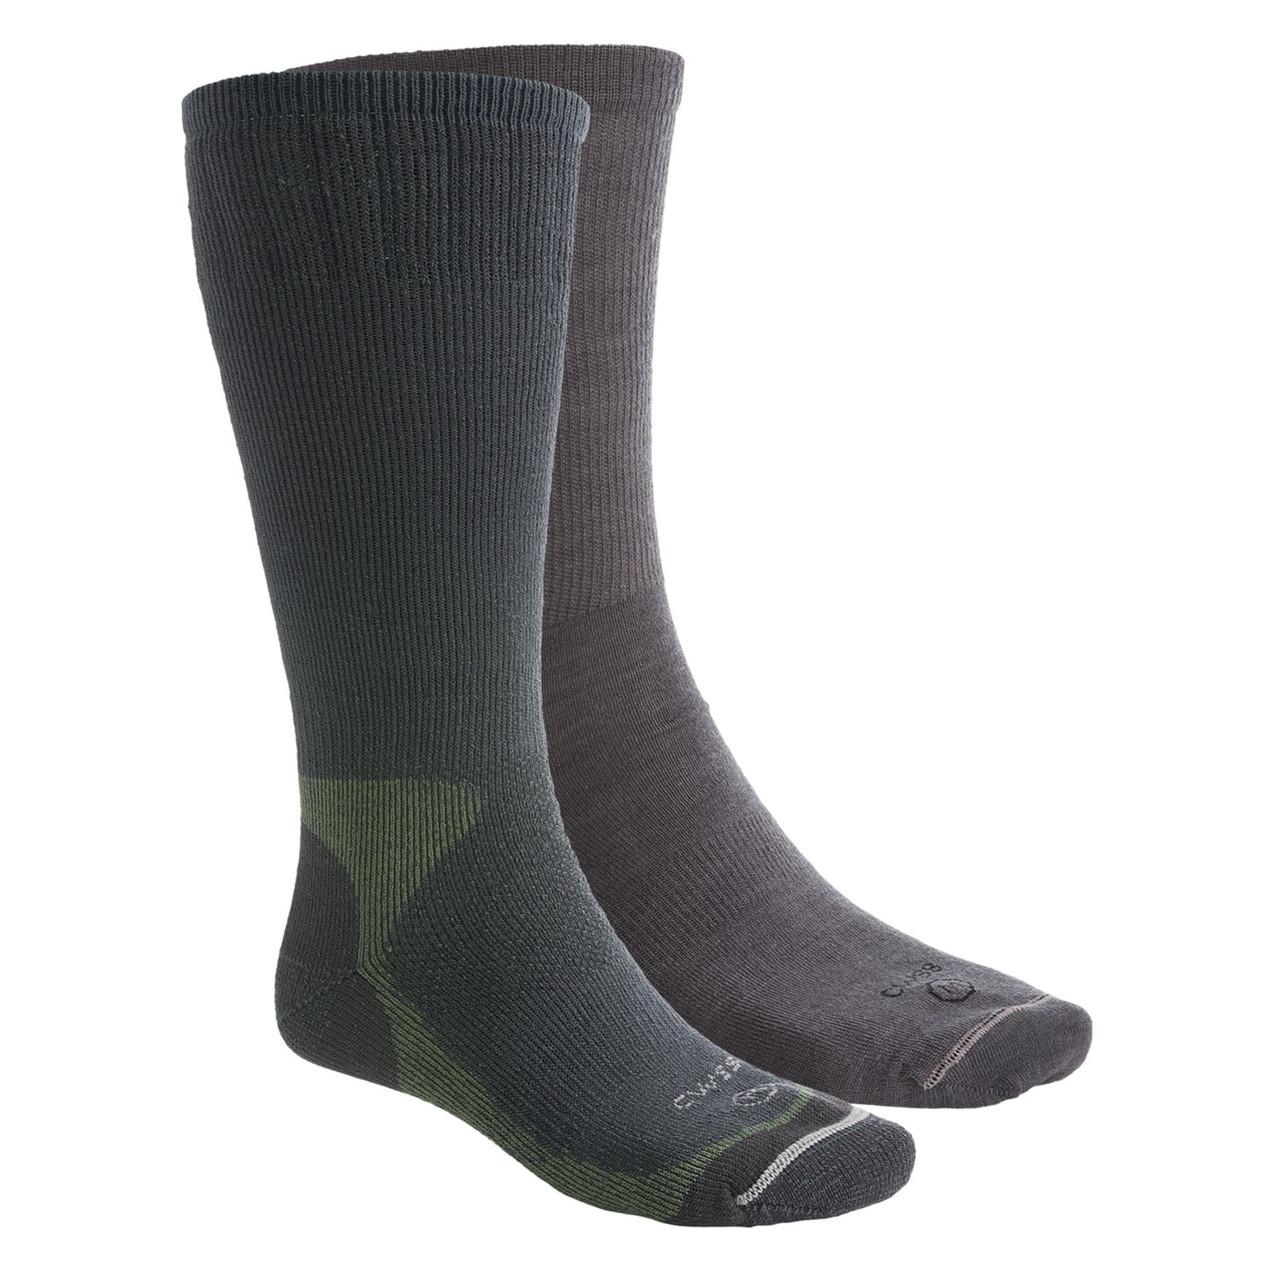 Термоноски Lorpen CWSS (Cold Weather Sock System Merino Wool) -  Интернет-магазин снаряжения 0c8c6c296cf74